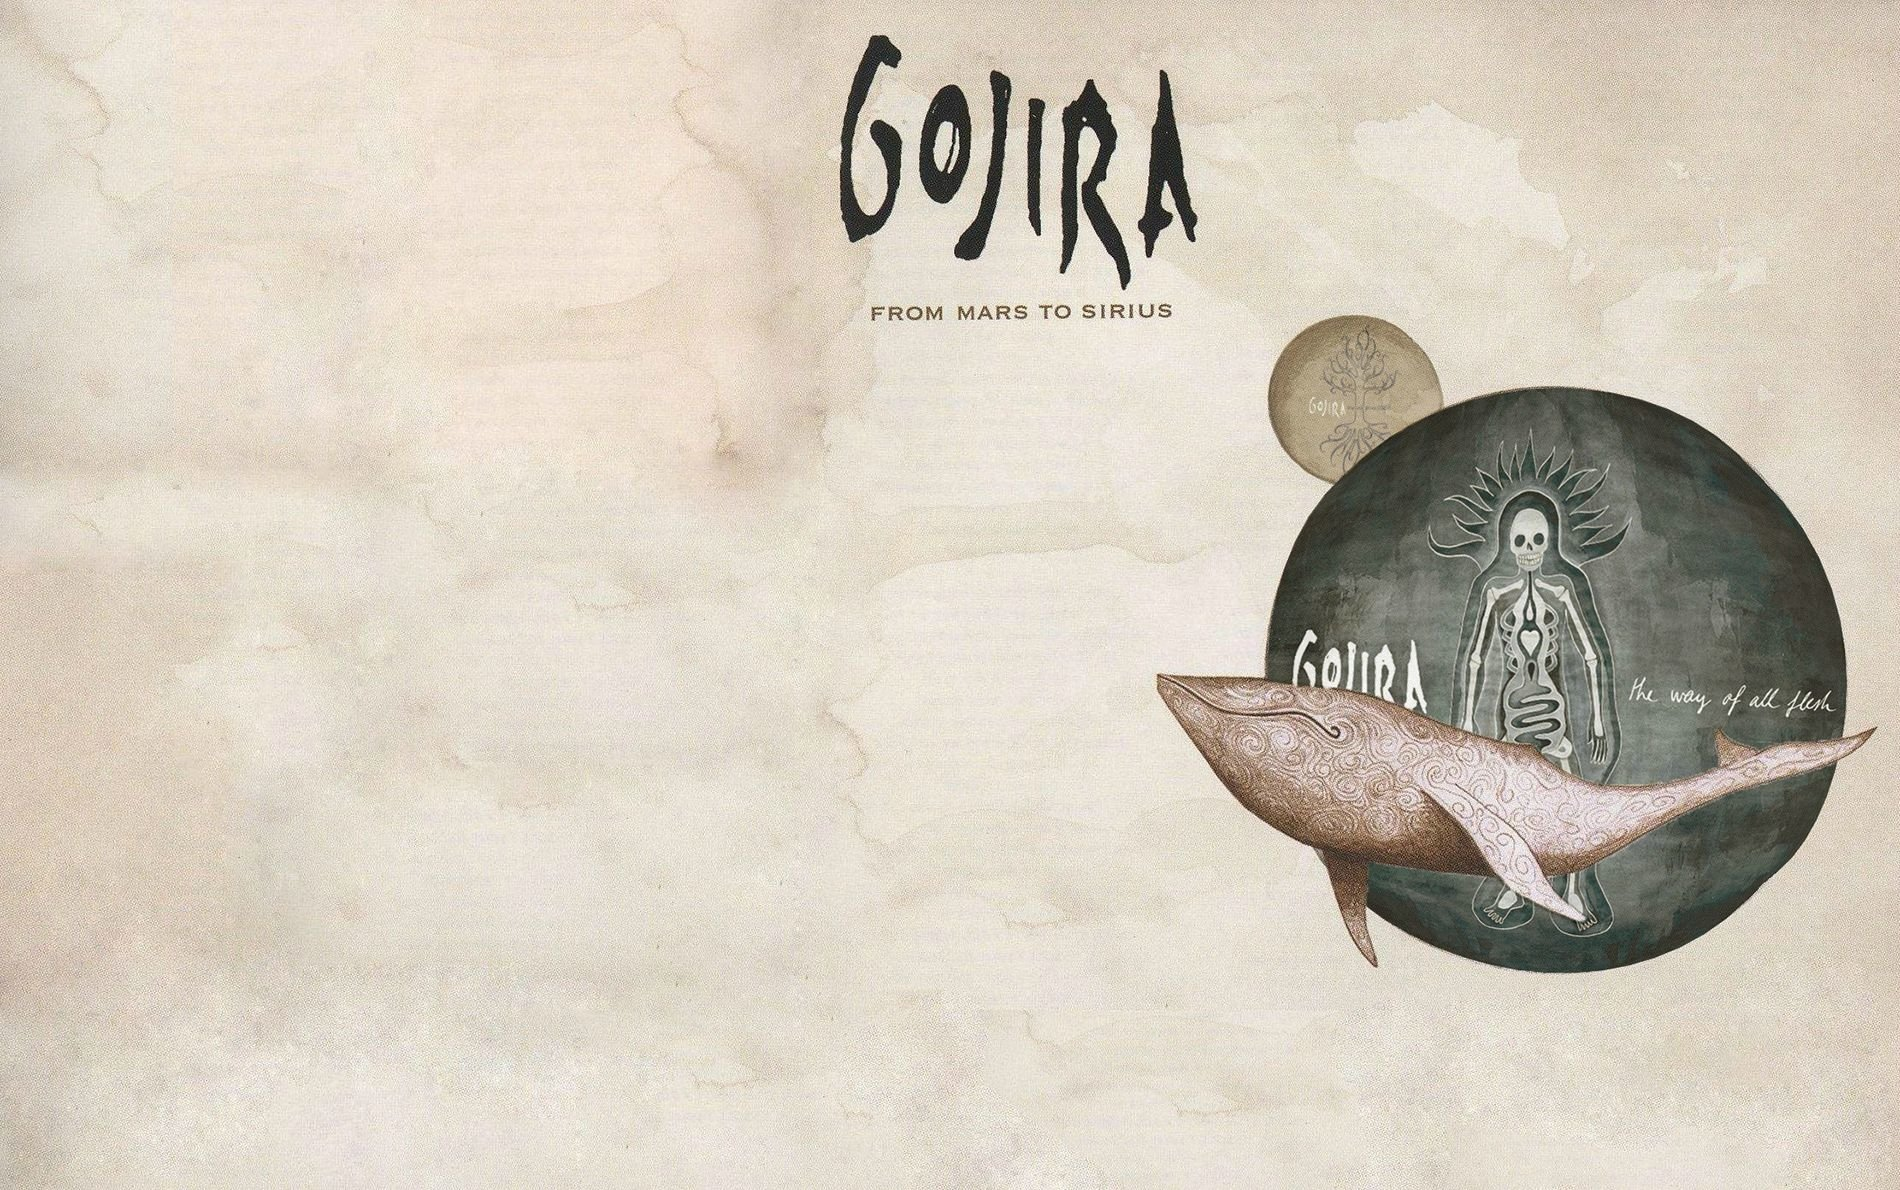 Gojira Wallpaper and Background Image 1900x1190 ID584105 1900x1190